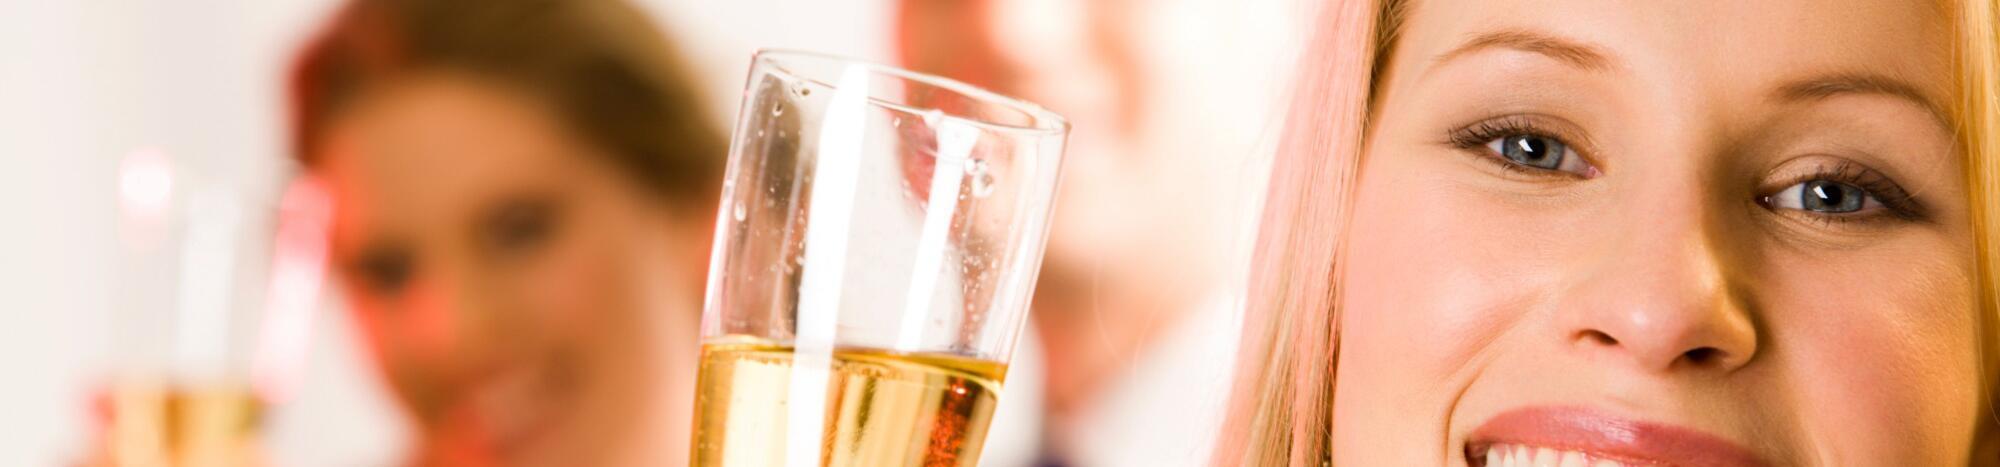 Angebot Silvester Rimini im All Inclusive Hotel mit Silvesterdinner und Silvesterparty